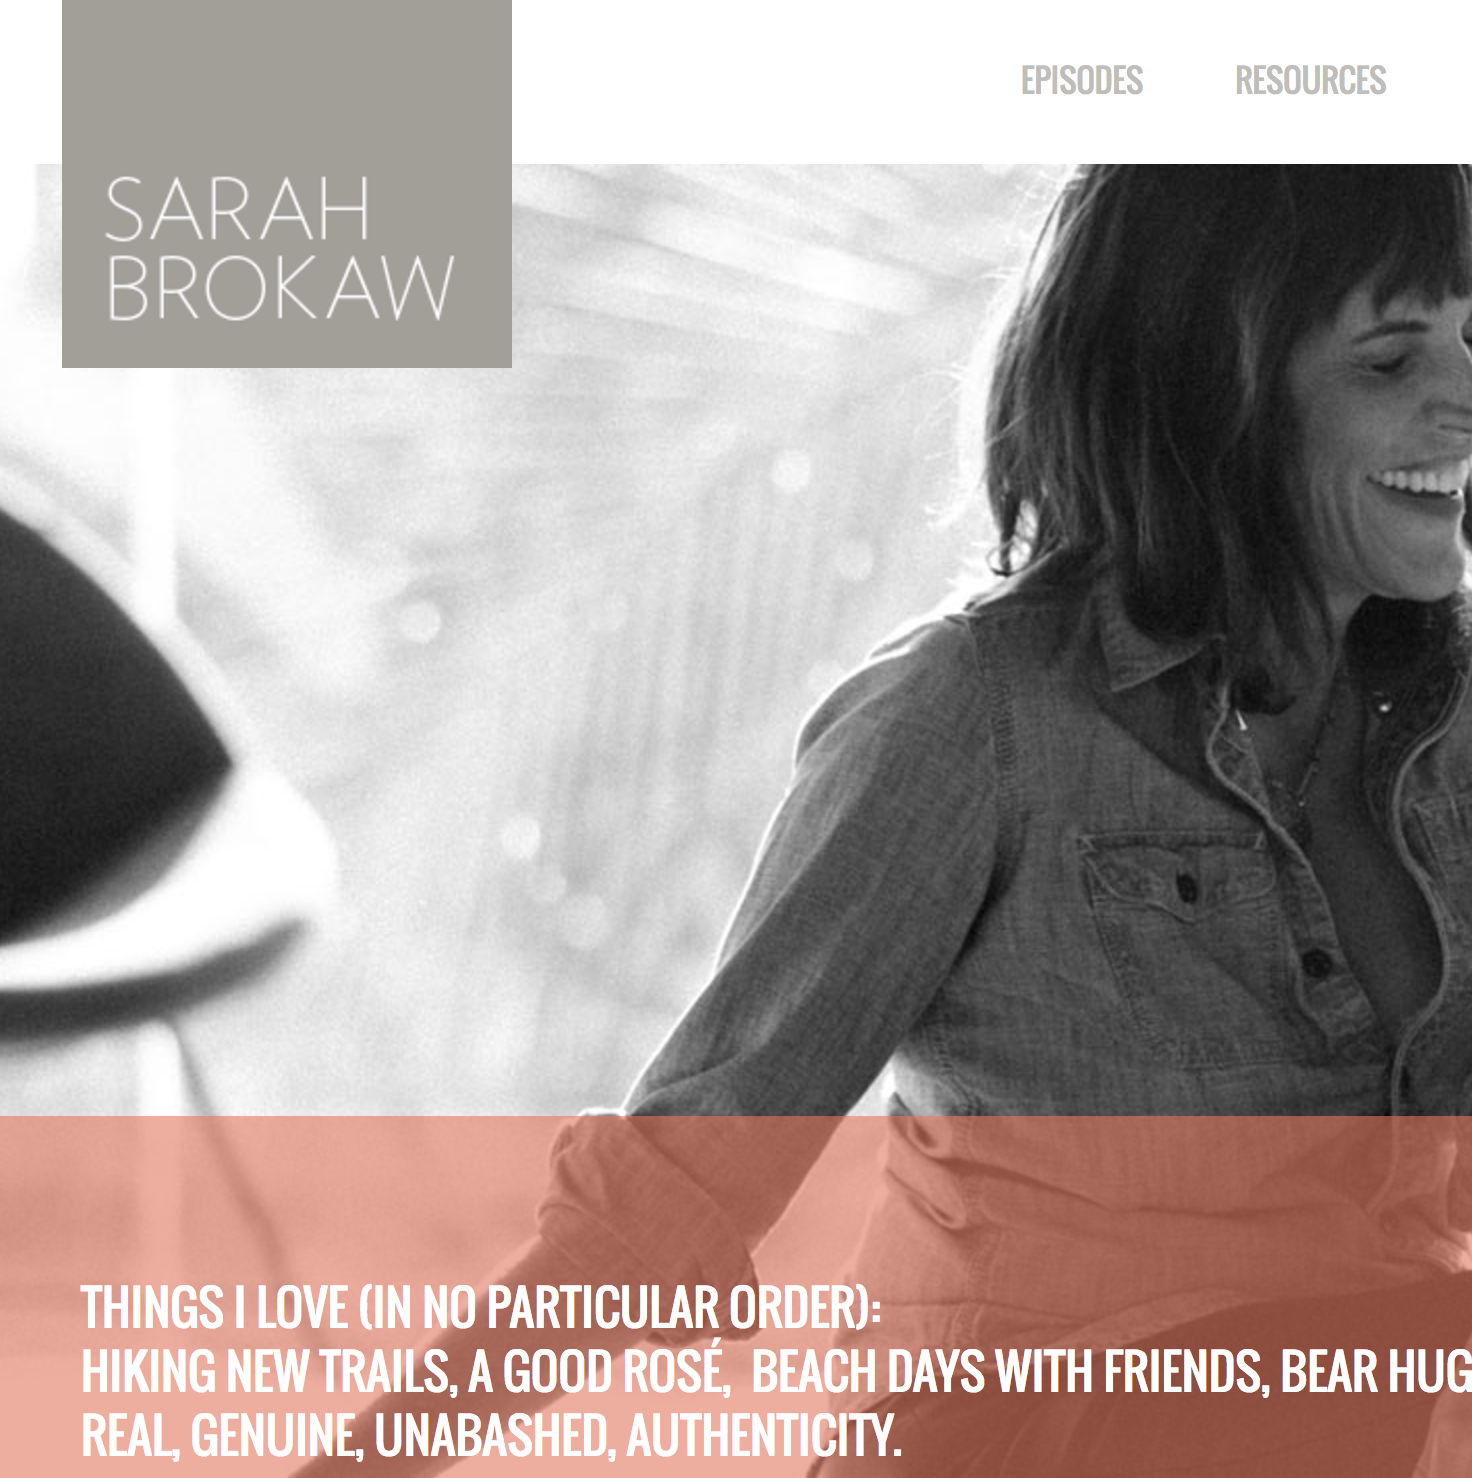 Sarah Brokaw - Shared Secrets - Mila Morgan Studio - Microcurrent Therapy